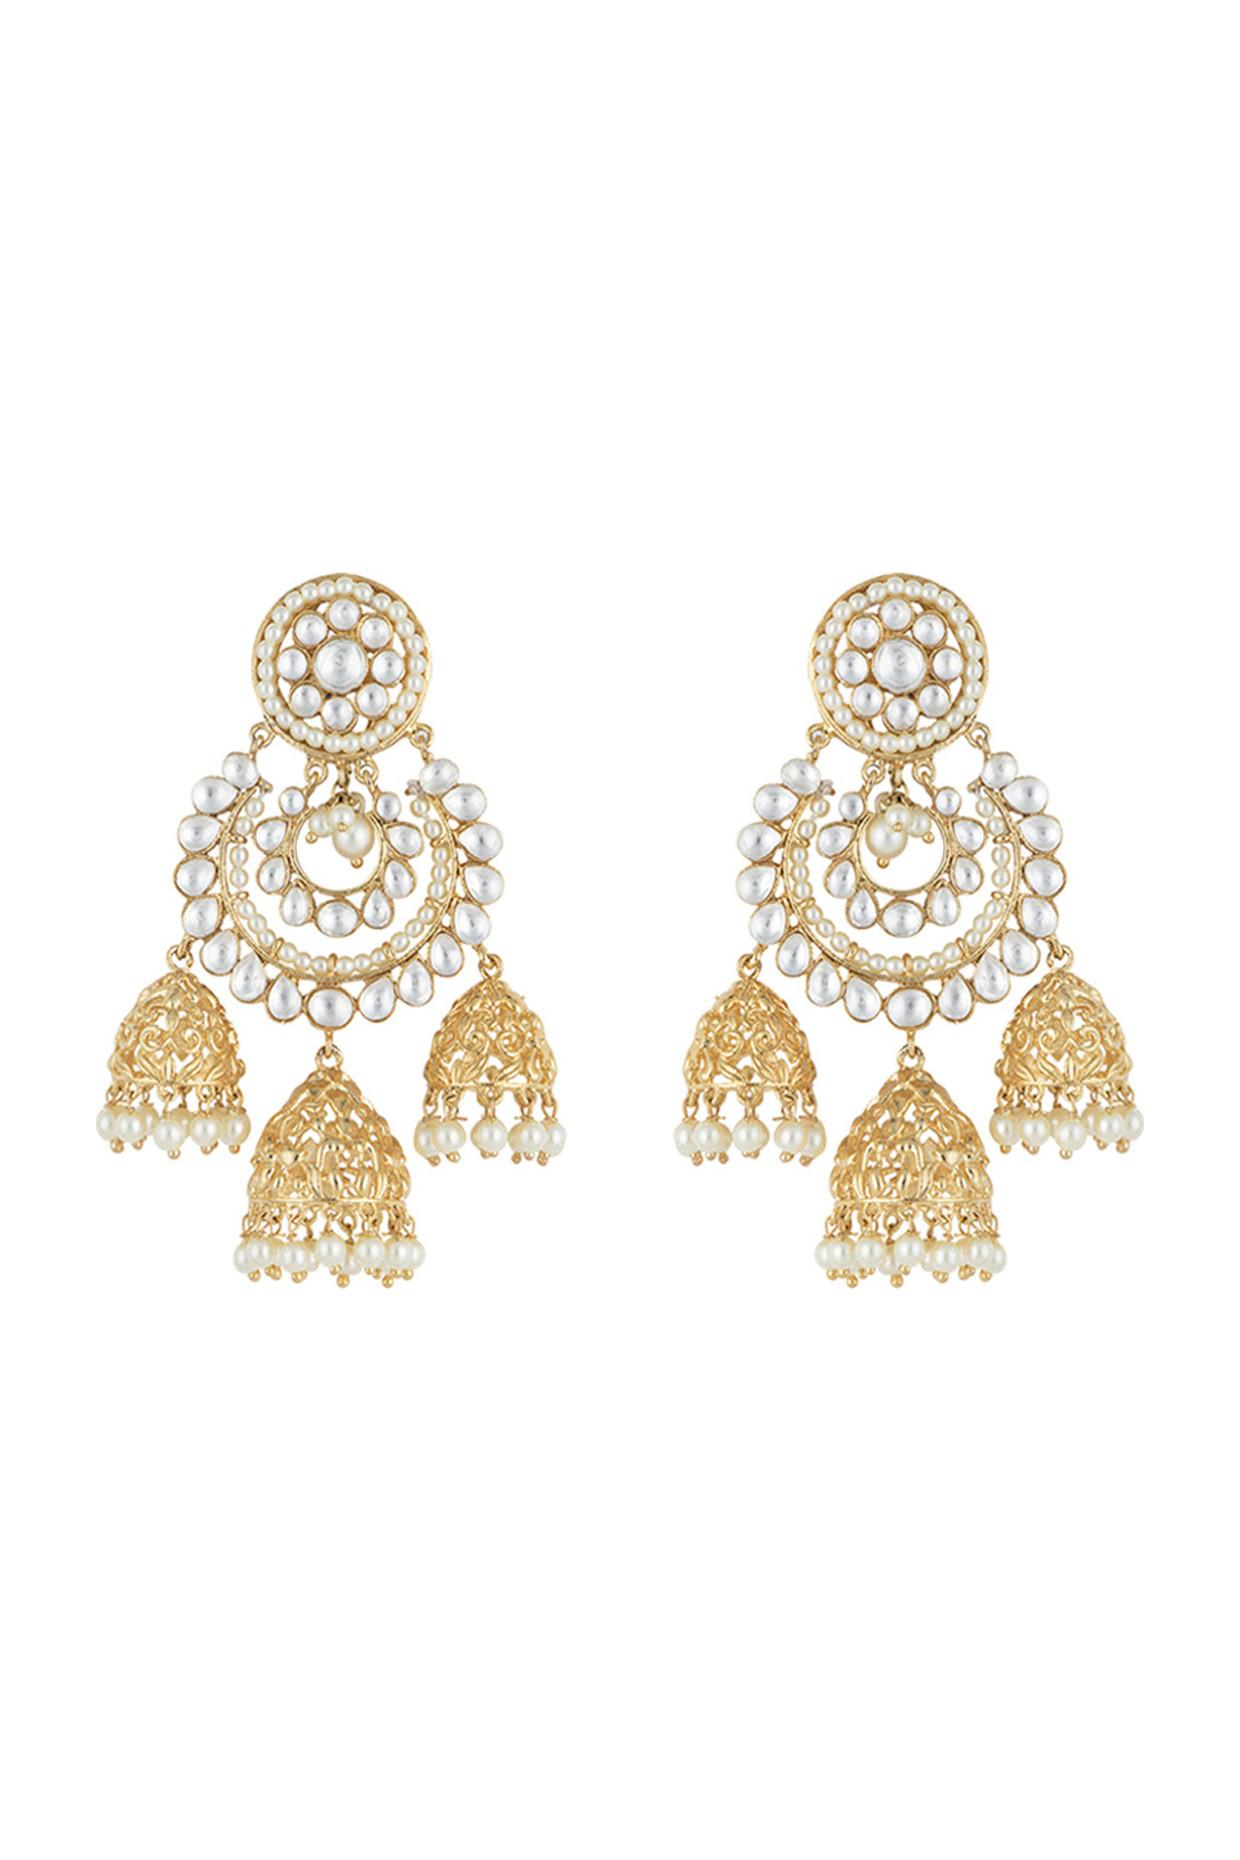 Gold plated faux kundan long chandbali earrings by Aster